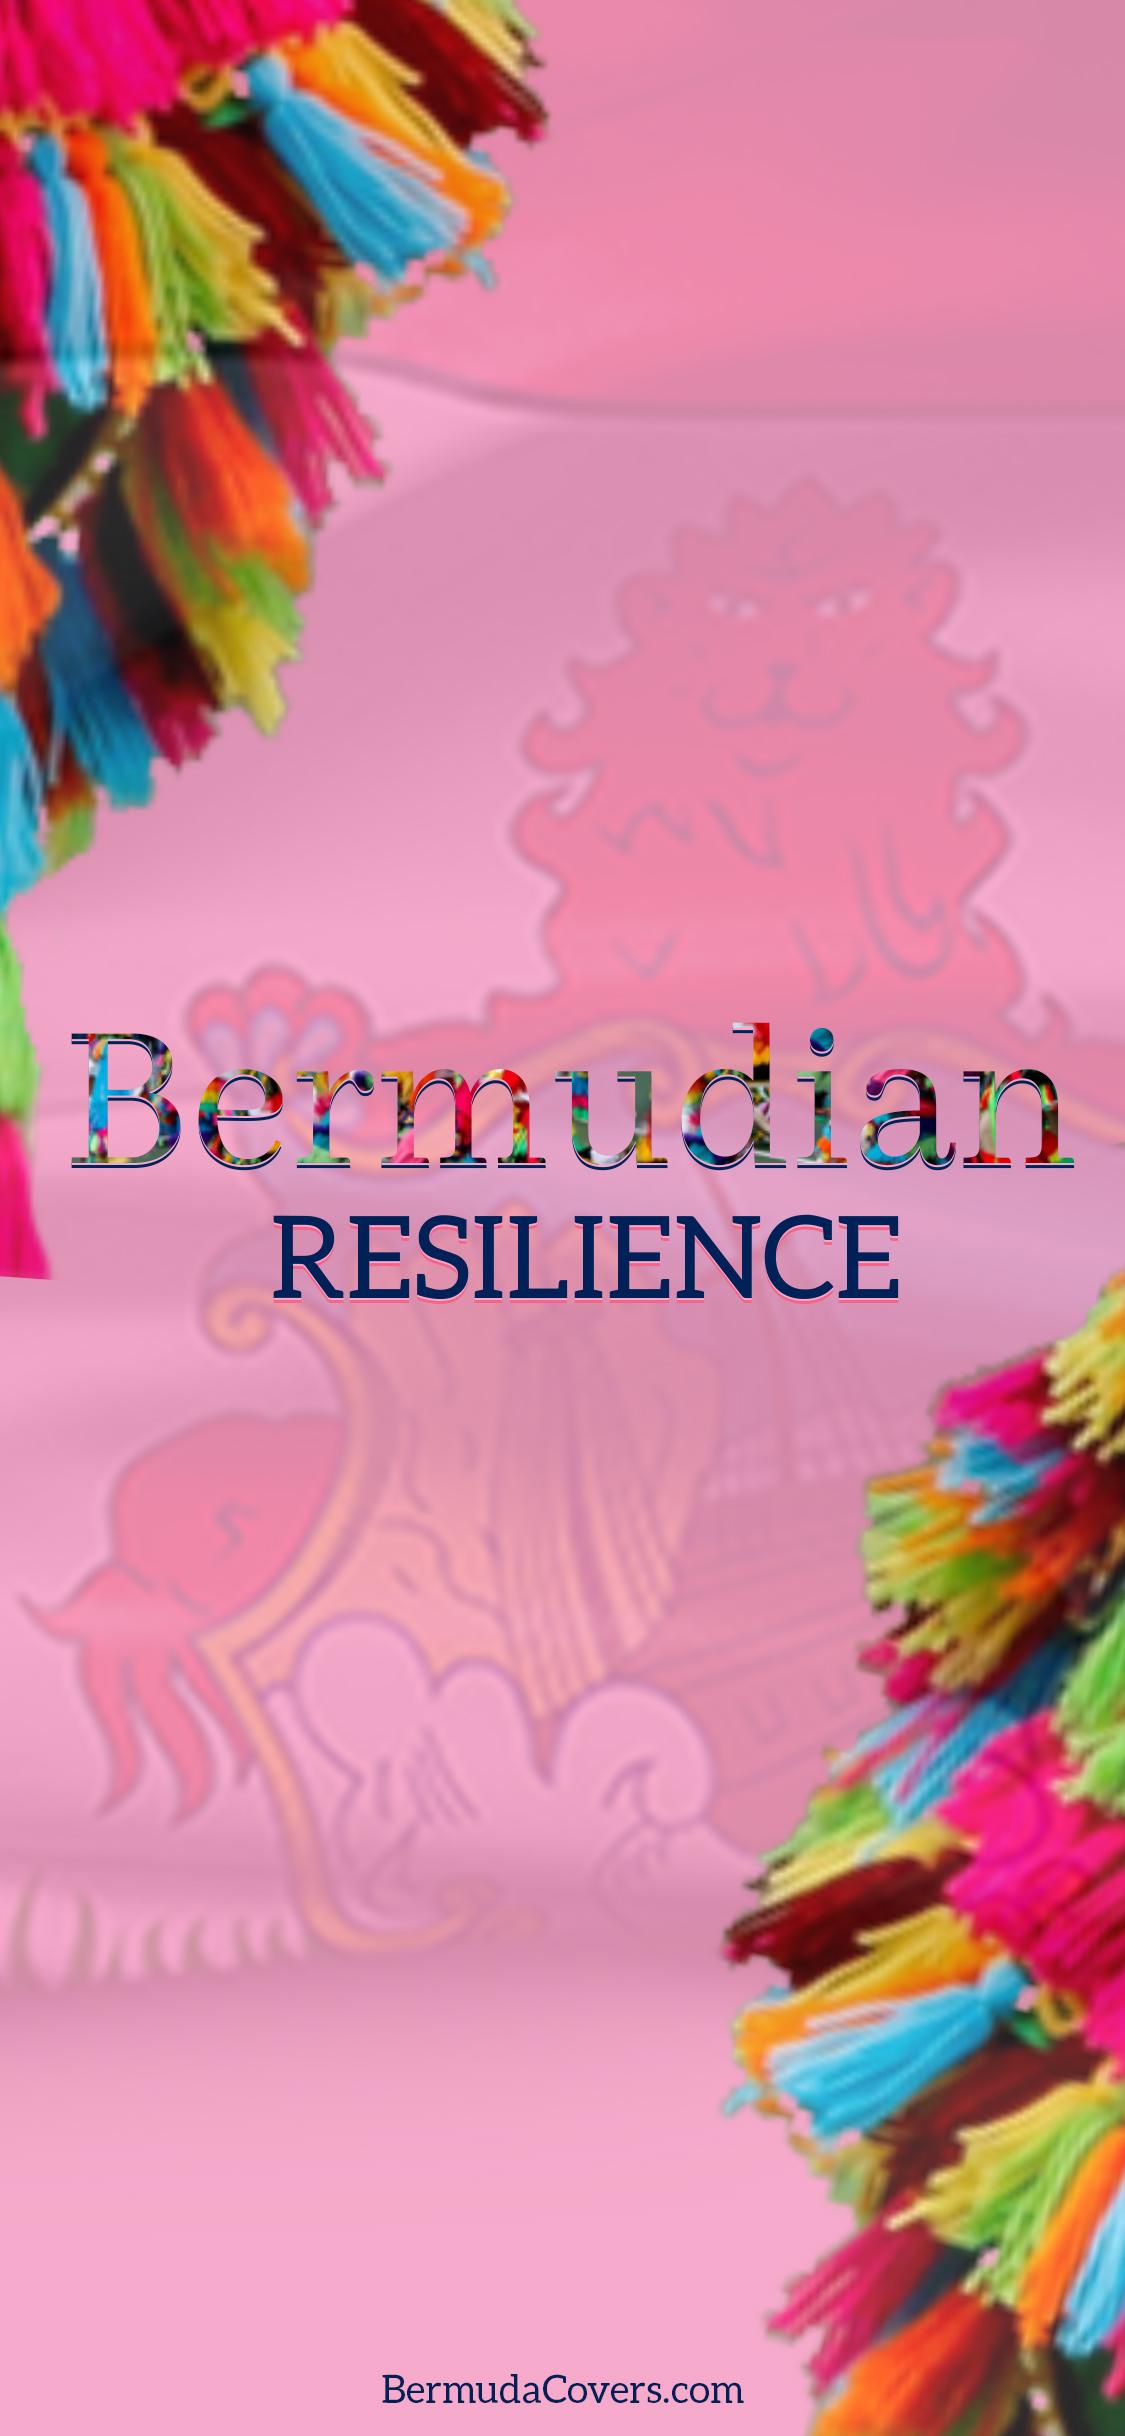 Bermudian-Resilience-Bernews-Mobile-phone-wallpaper-lock-screen-design-image-photo-UM4htMbV